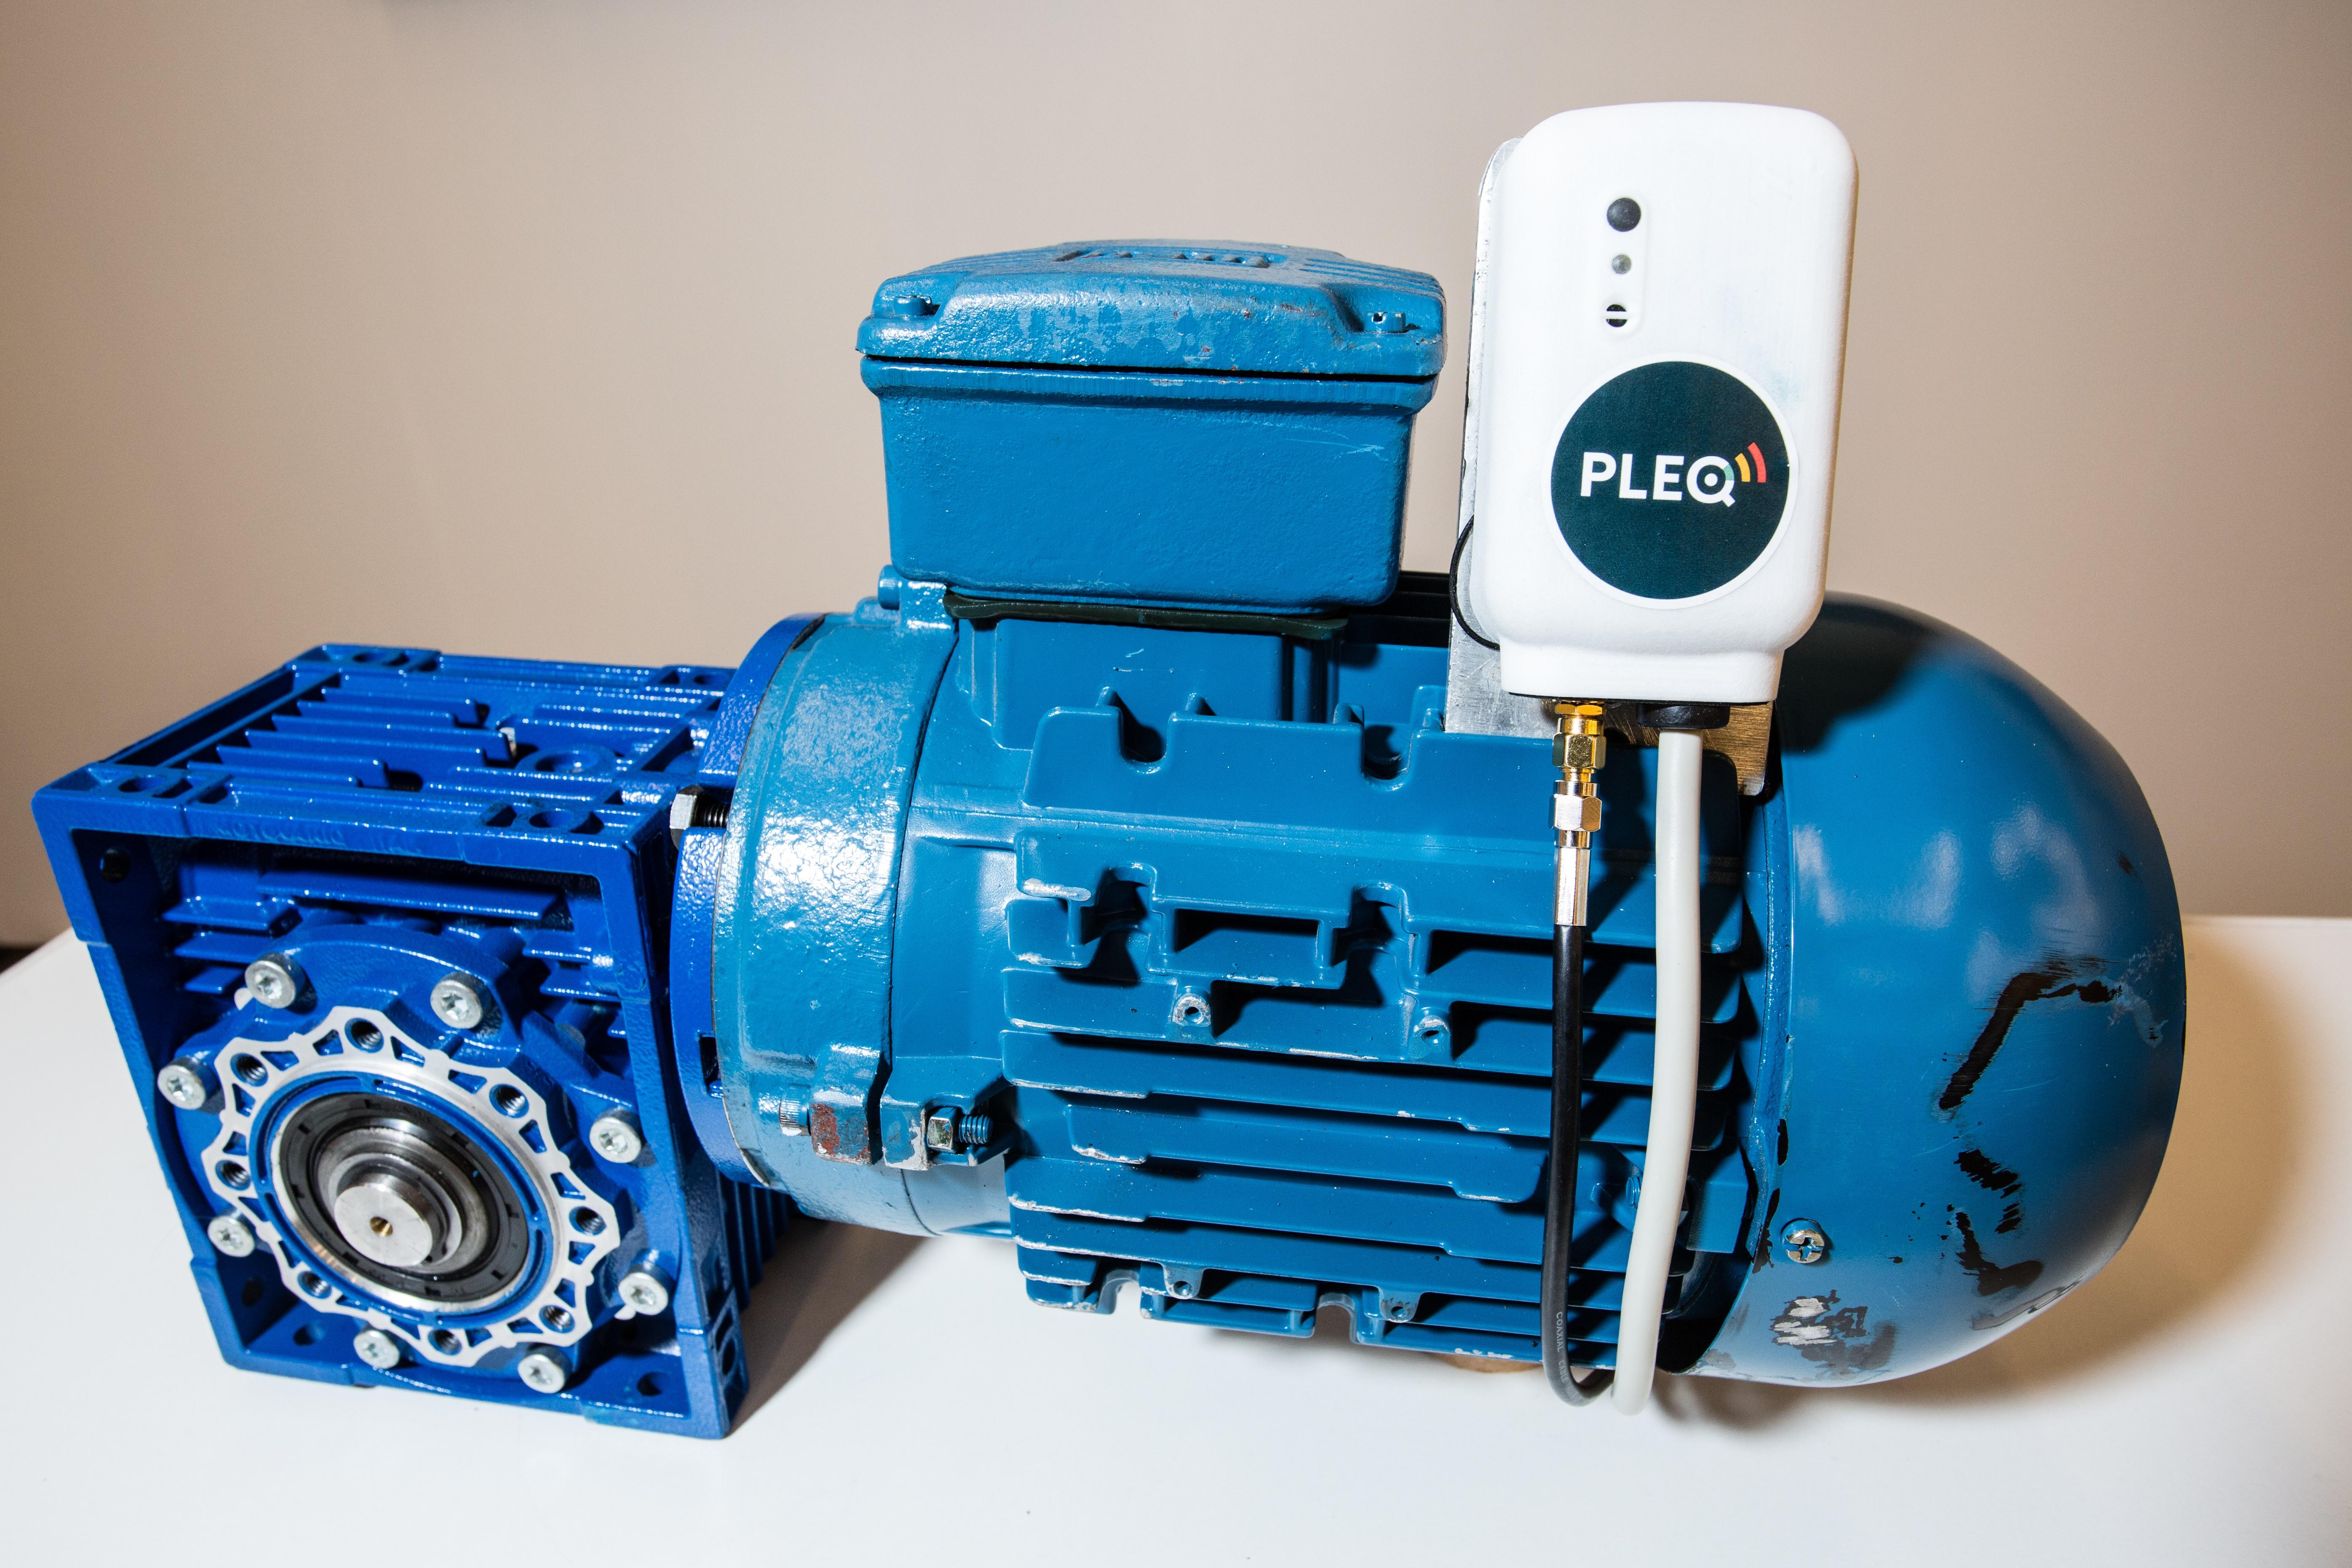 PLEQ motor